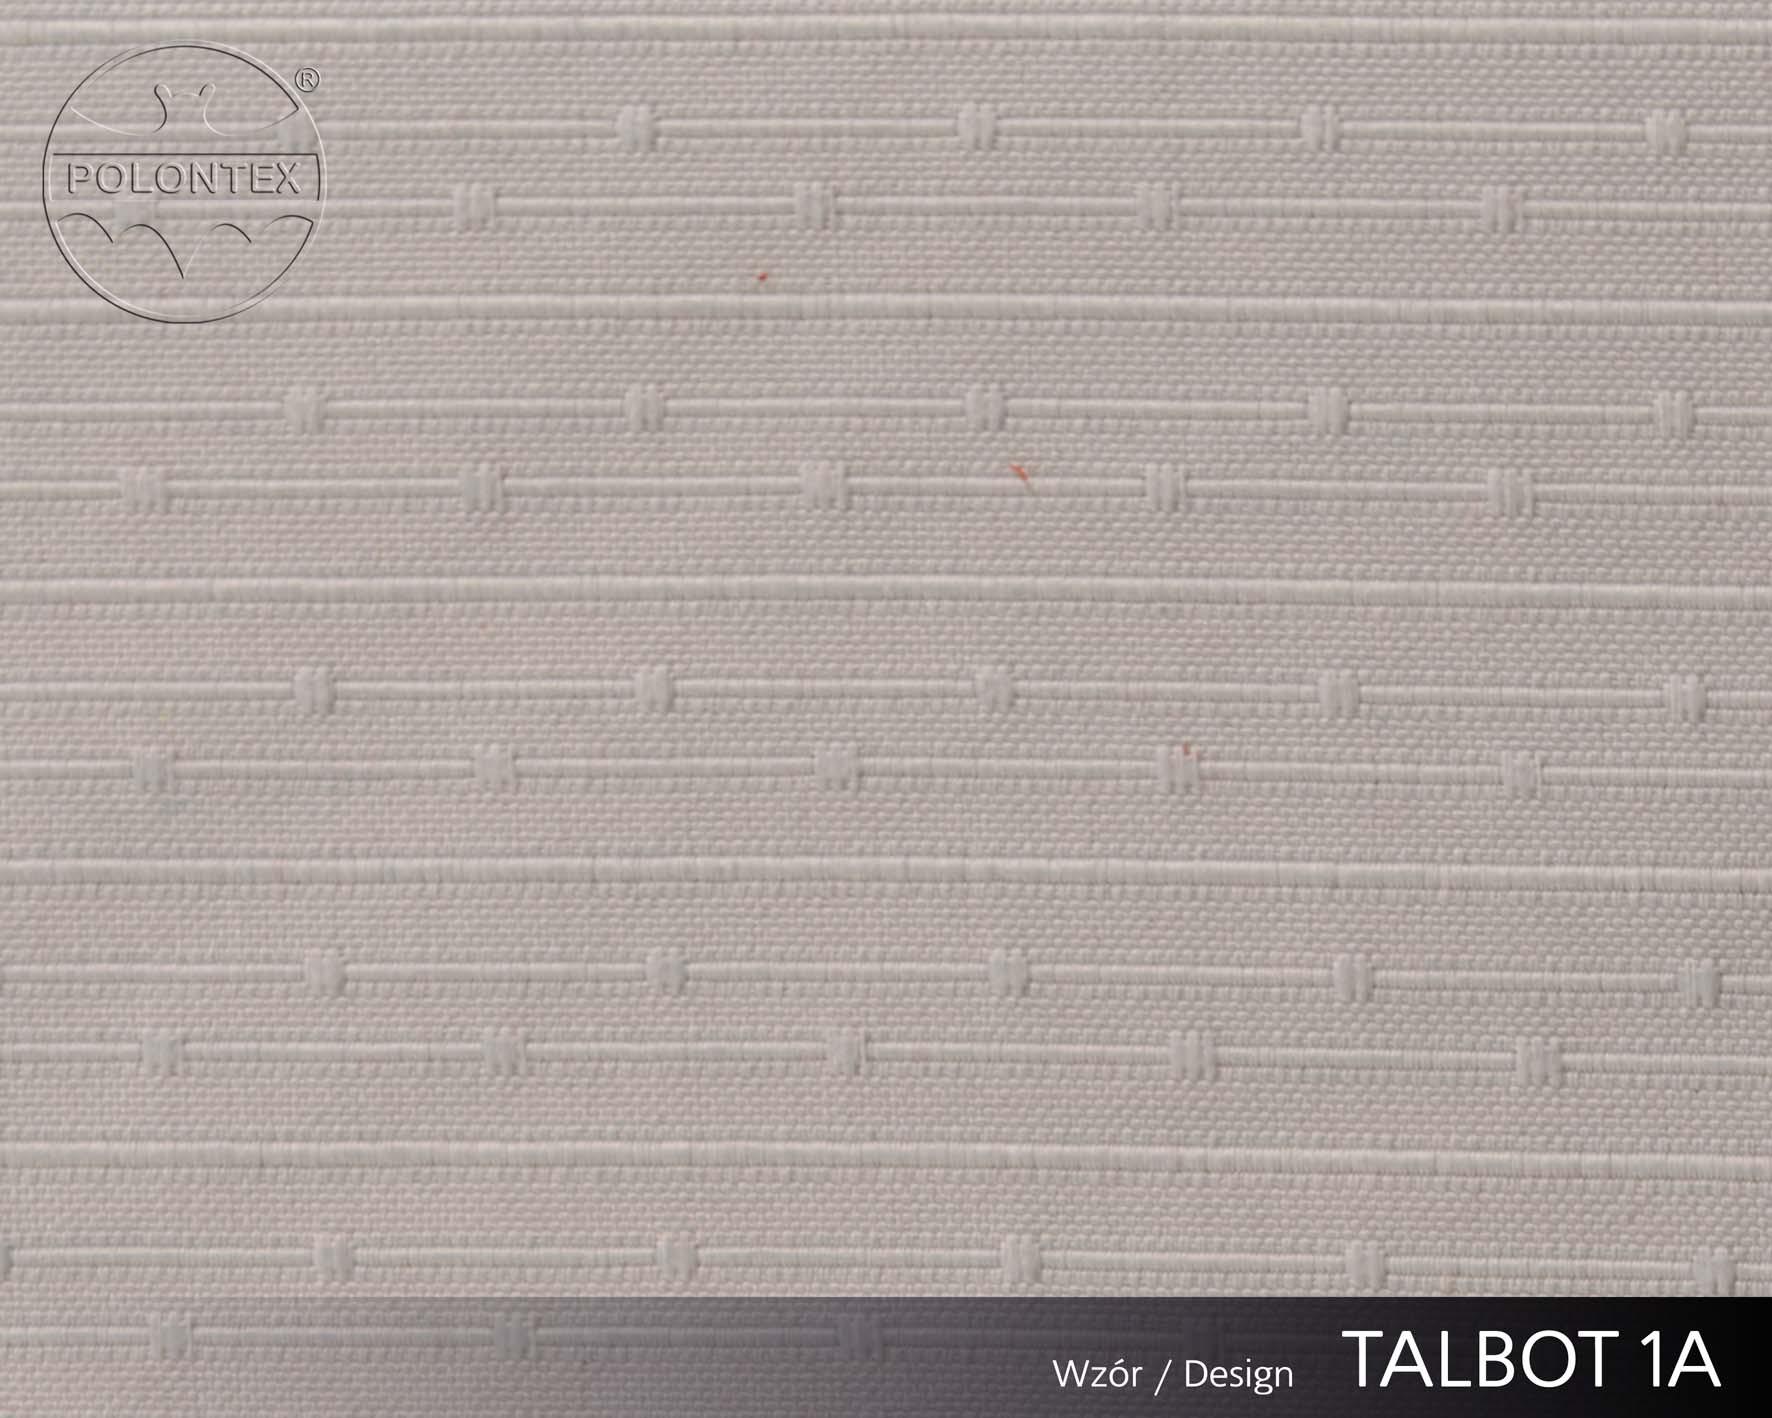 Talbot 1A 0001